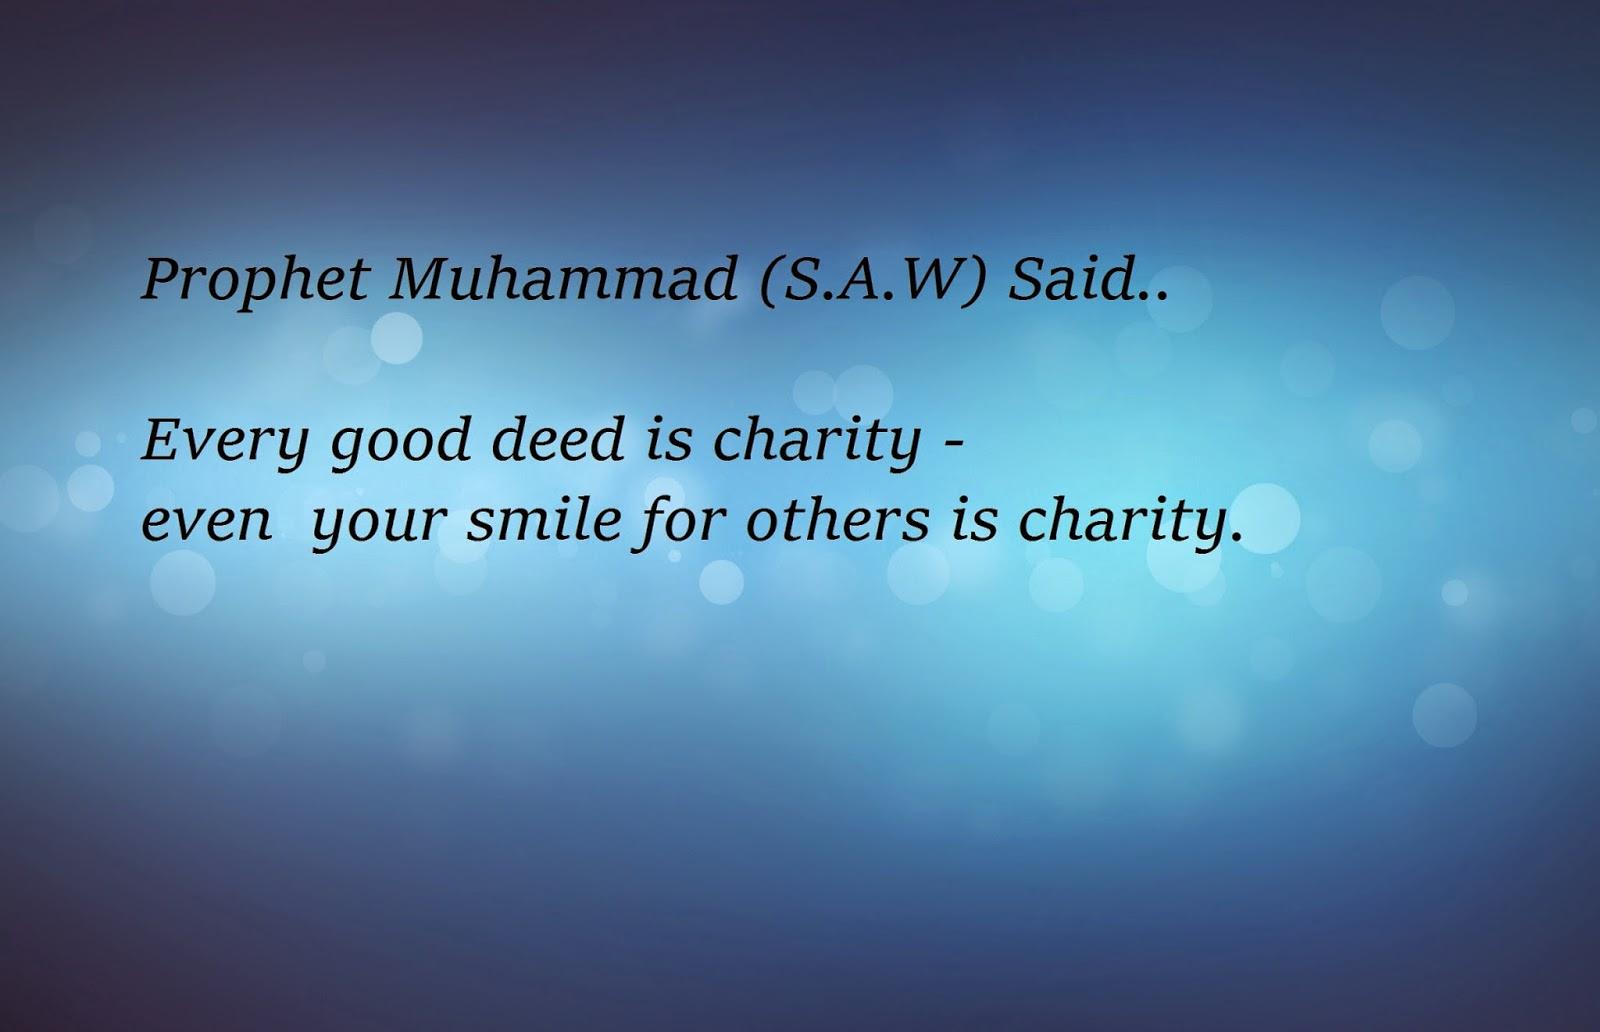 The Morning Charity Hadith